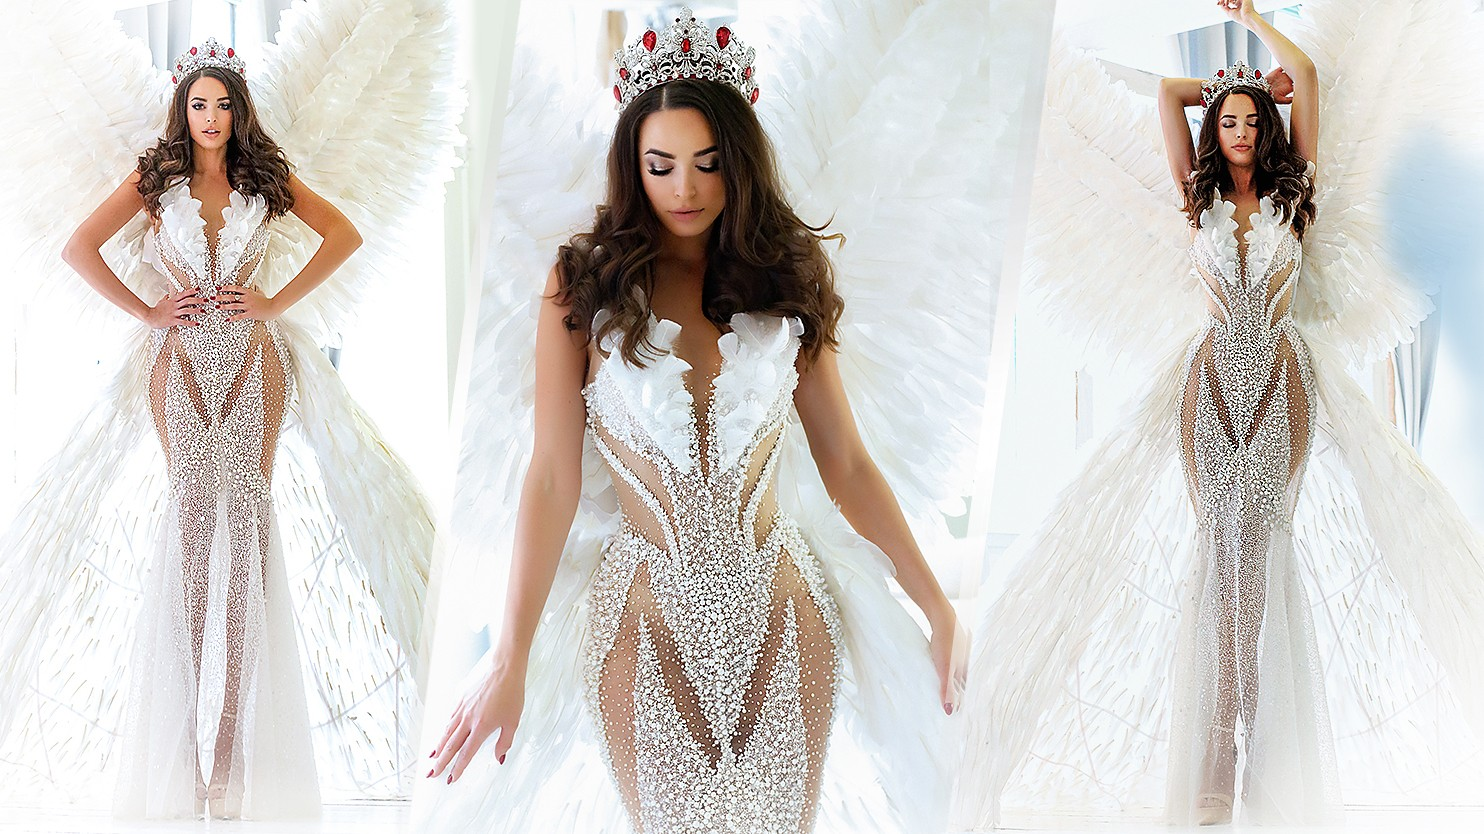 Zjawiskowa suknia Miss Polski na konkurs Miss Universe 2019